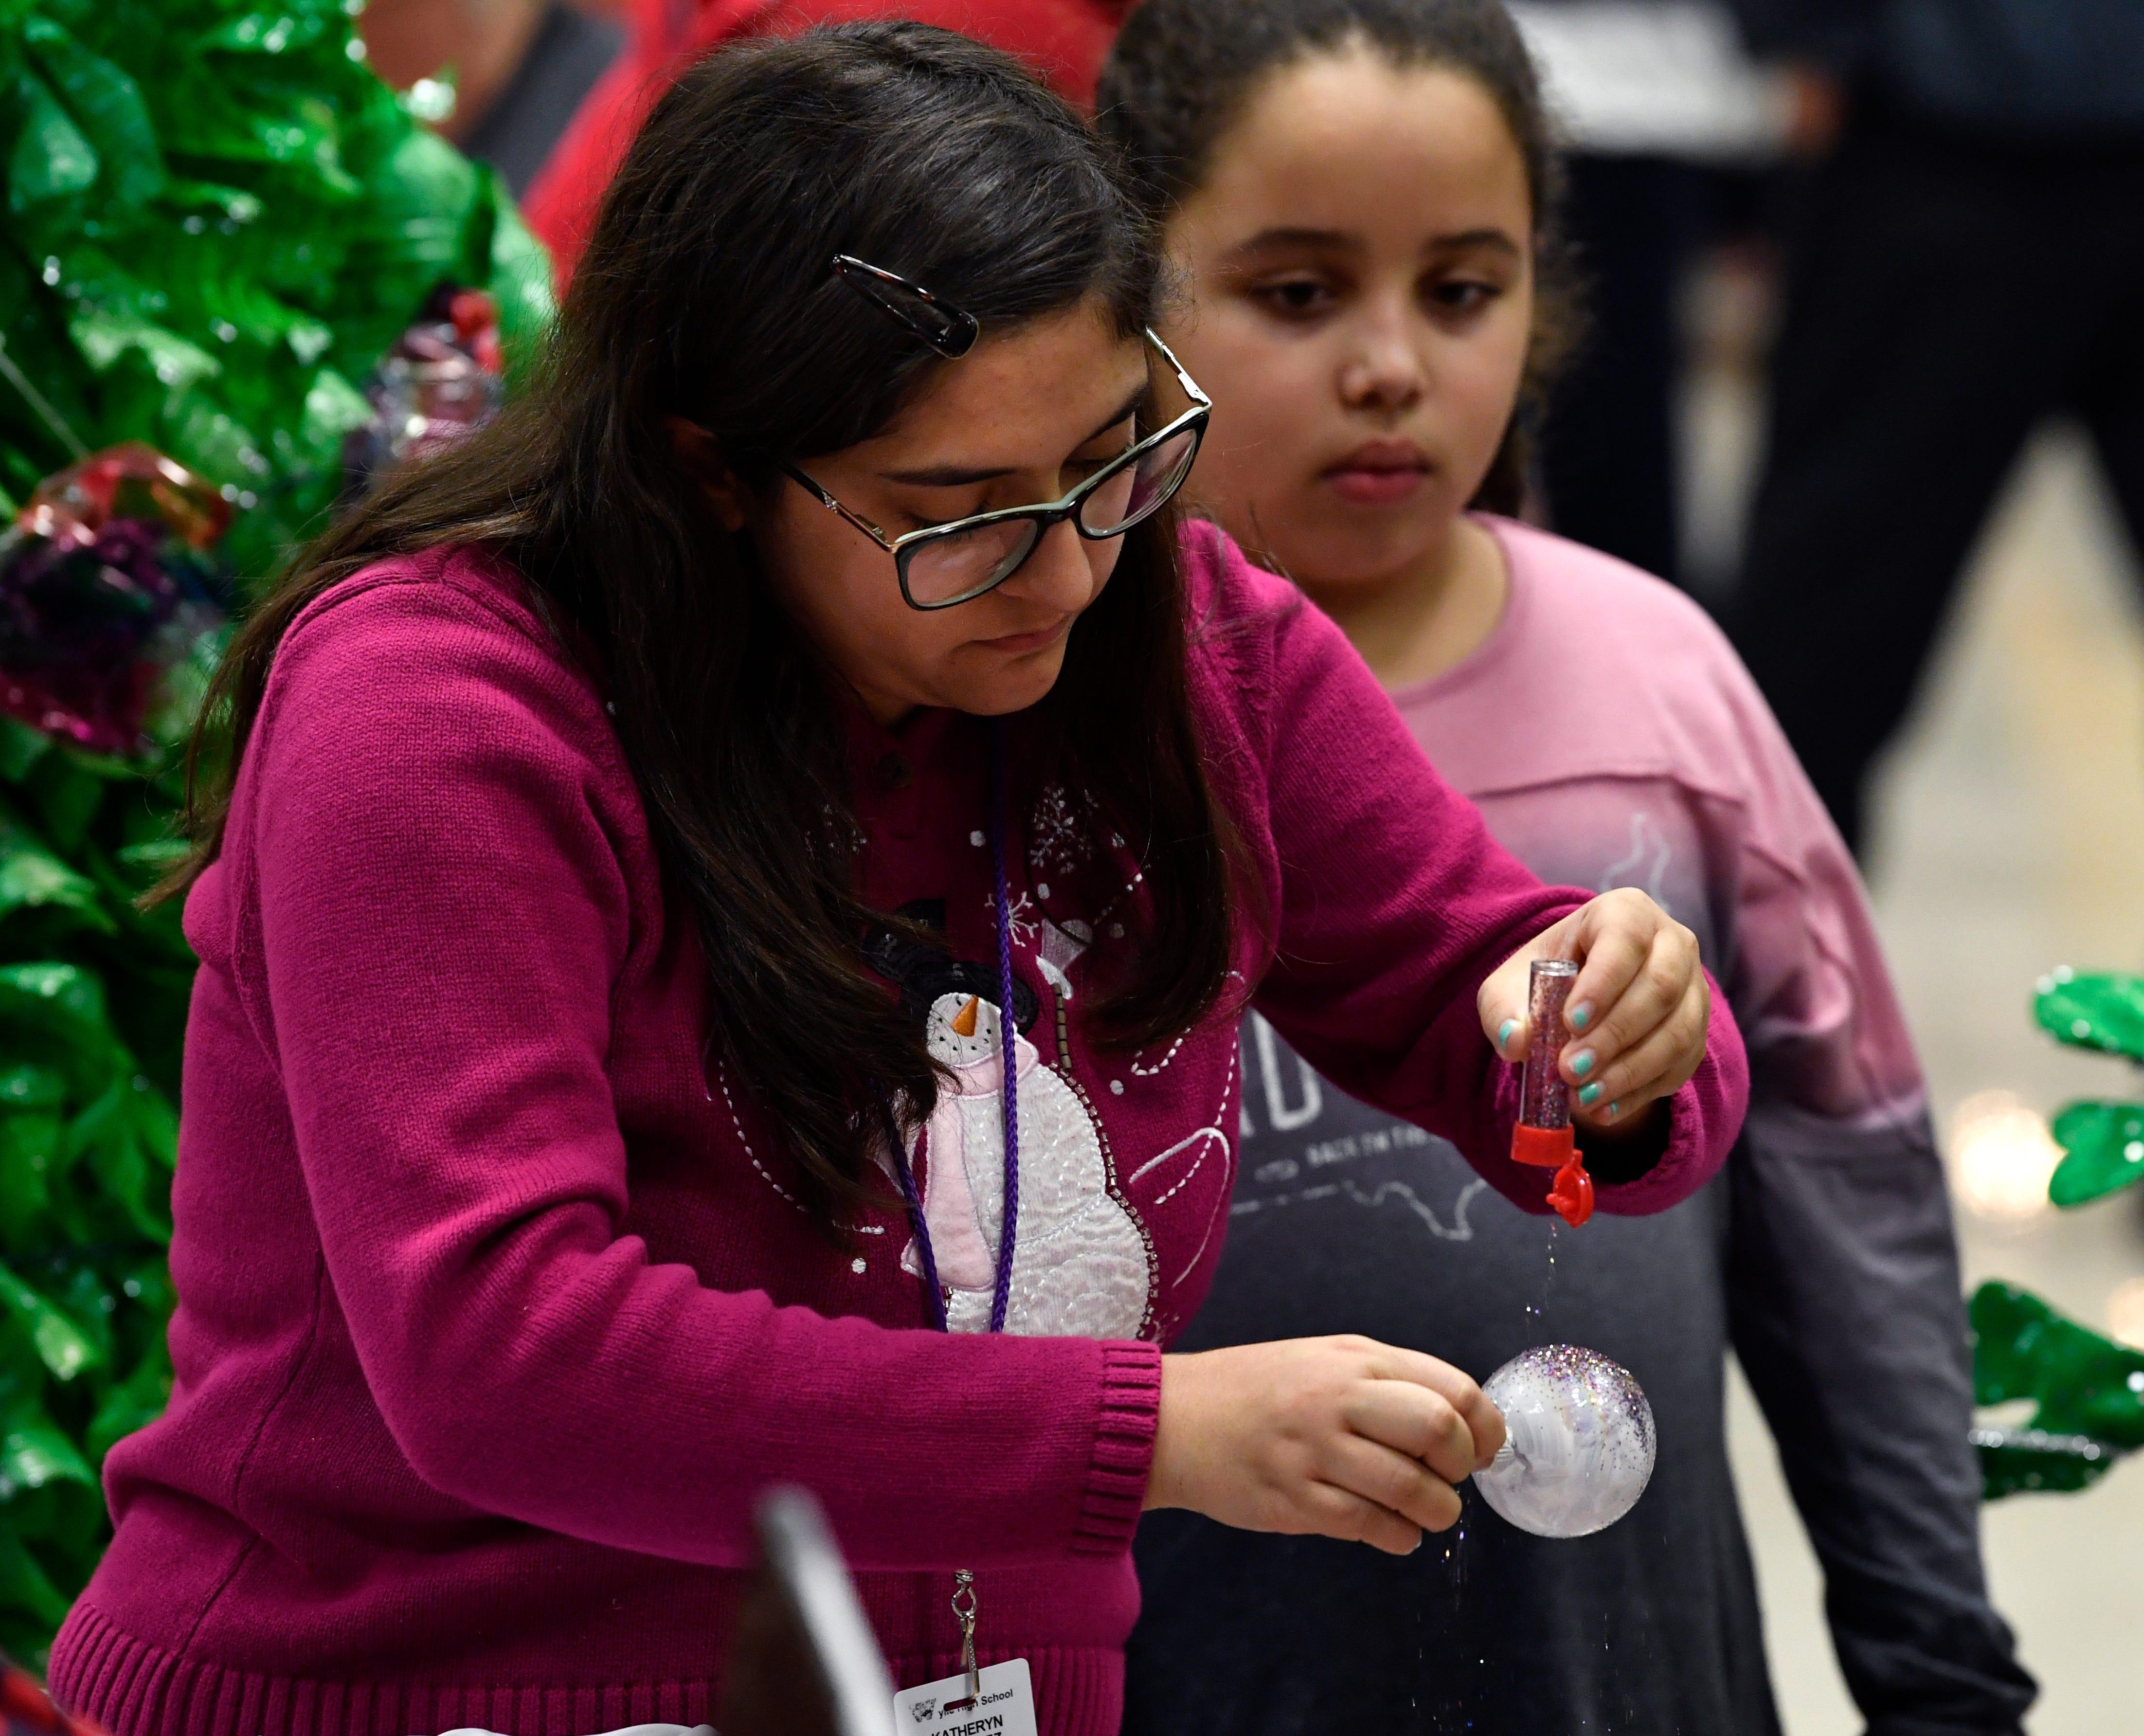 Katheryn Sanchez, a senior at Wylie High School, sprinkles glitter on an ornament during the Bulldog Christmas Market Thursday.